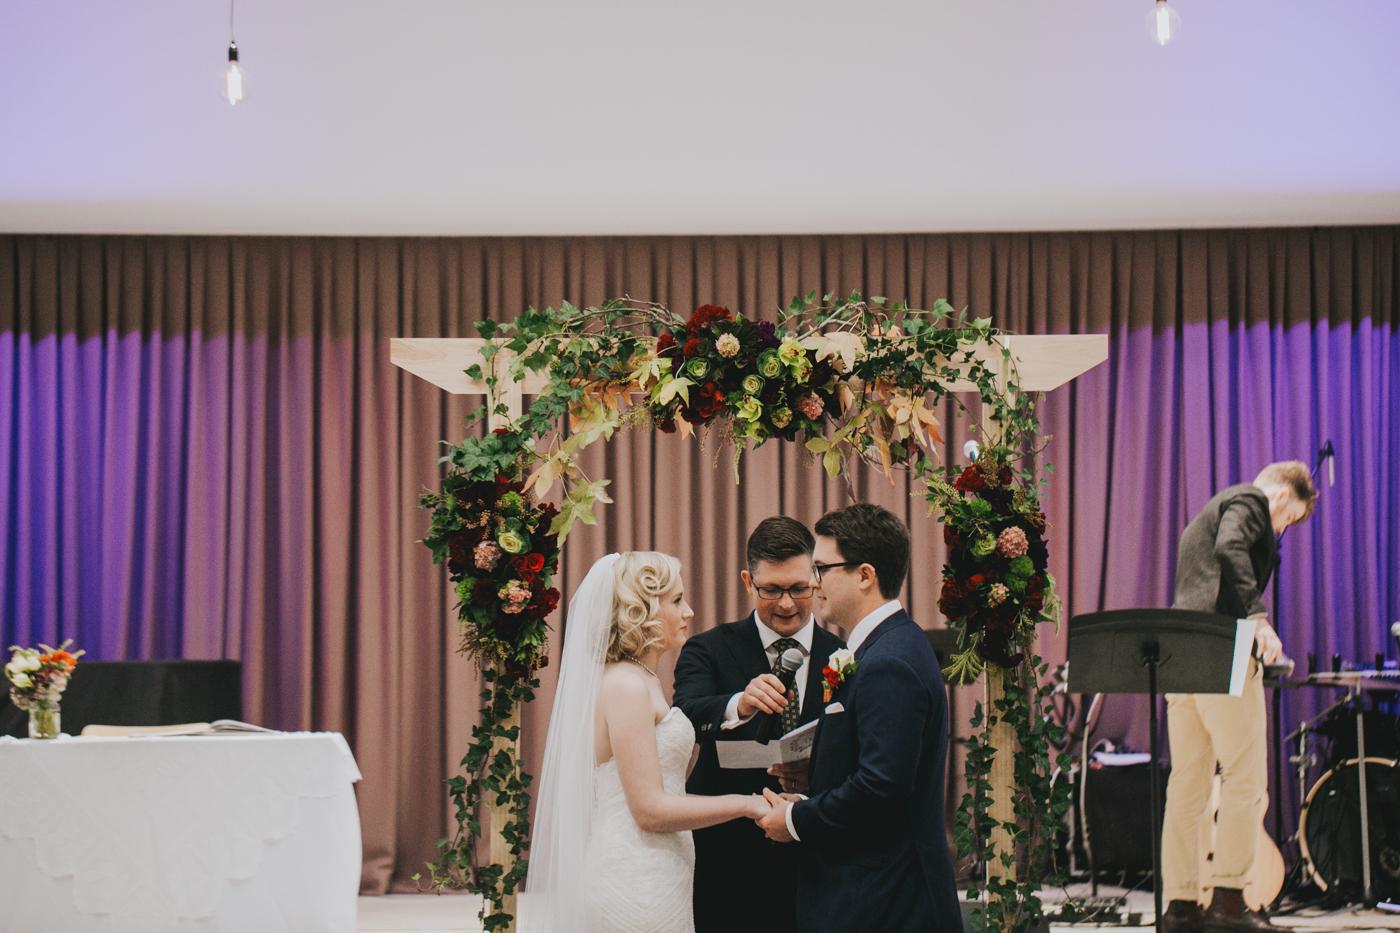 Jo & Tom Wedding - The Grounds of Alexandria - Samantha Heather Photography-115.jpg